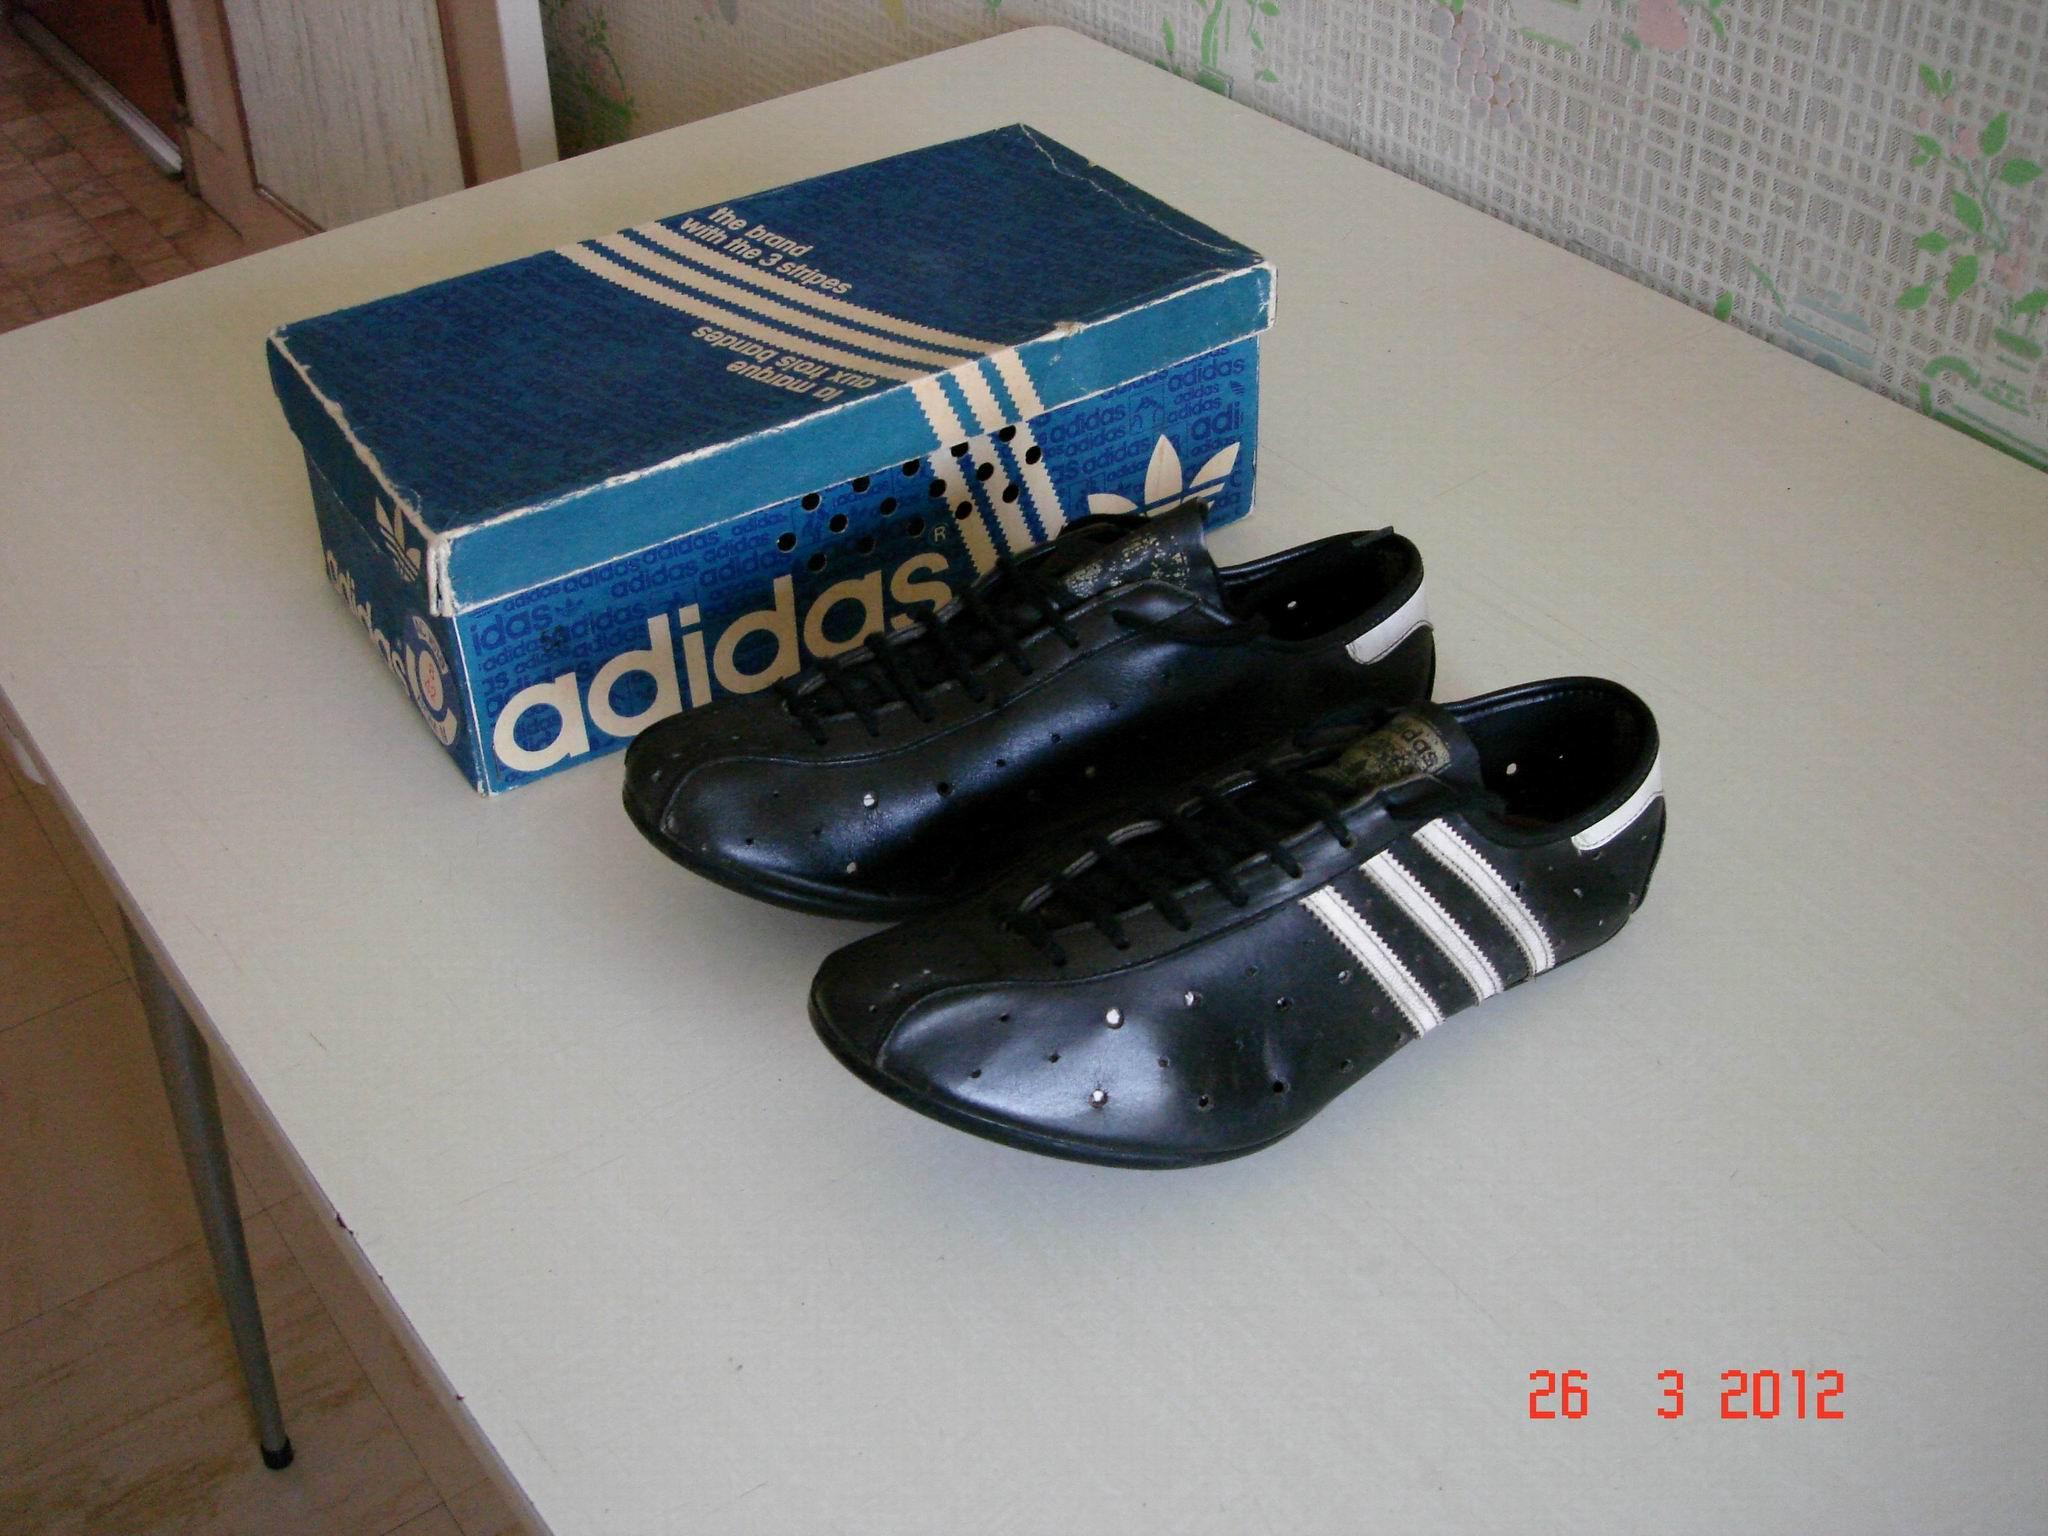 chaussures adidas velo